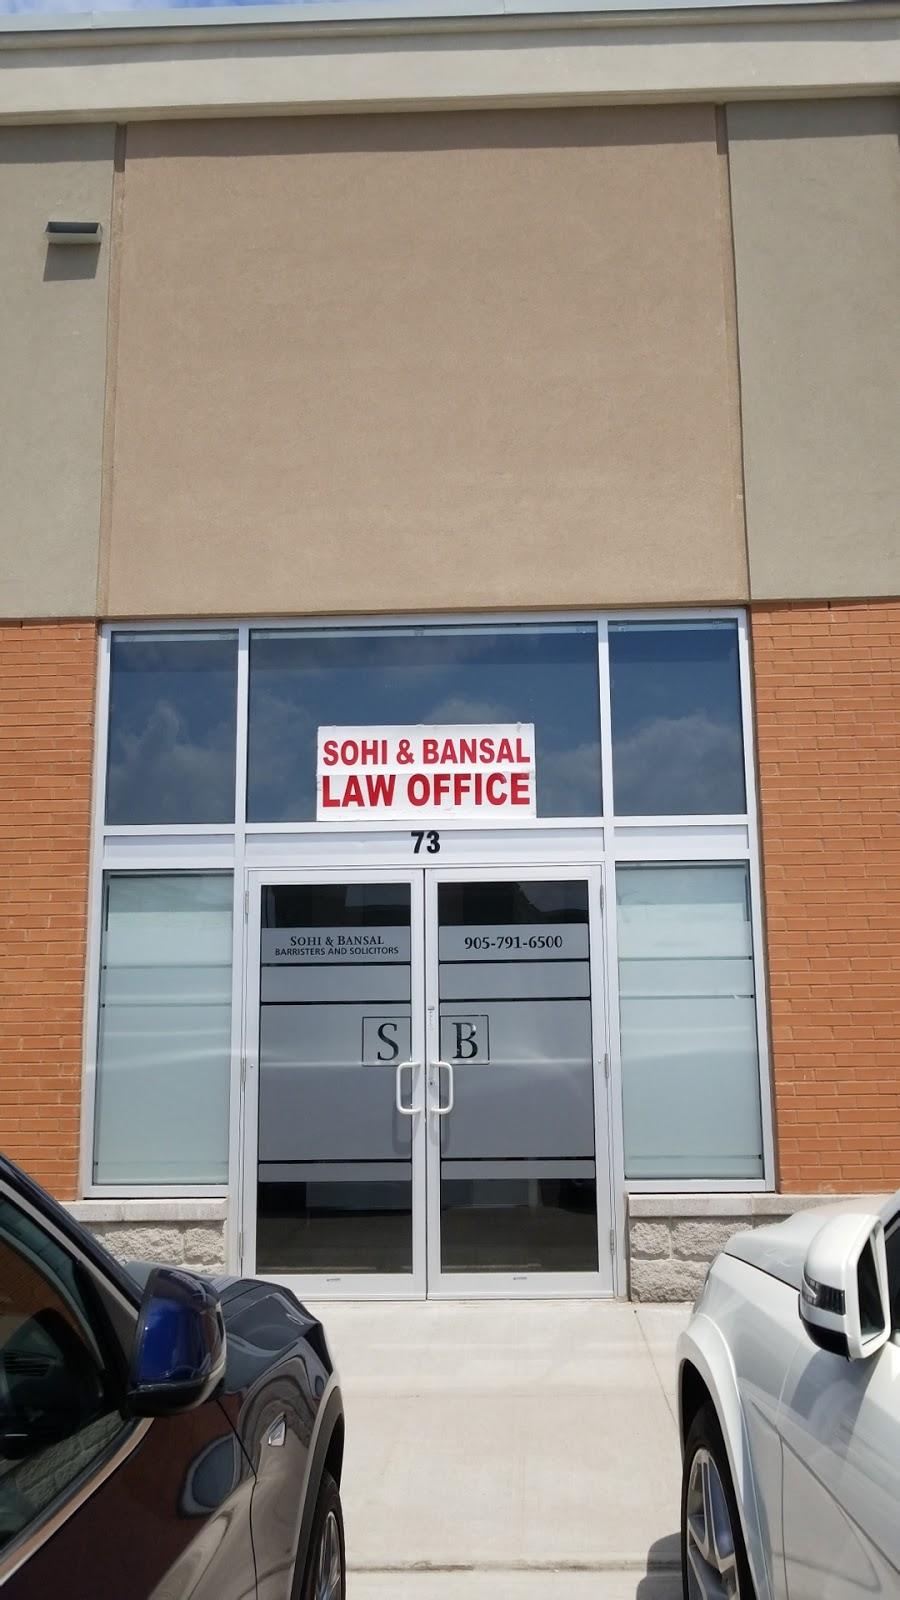 Sohi & Bansal Laywers Llp | lawyer | 100 Maritime Ontario Blvd Unit #73, Brampton, ON L6S 0E7, Canada | 9057916500 OR +1 905-791-6500